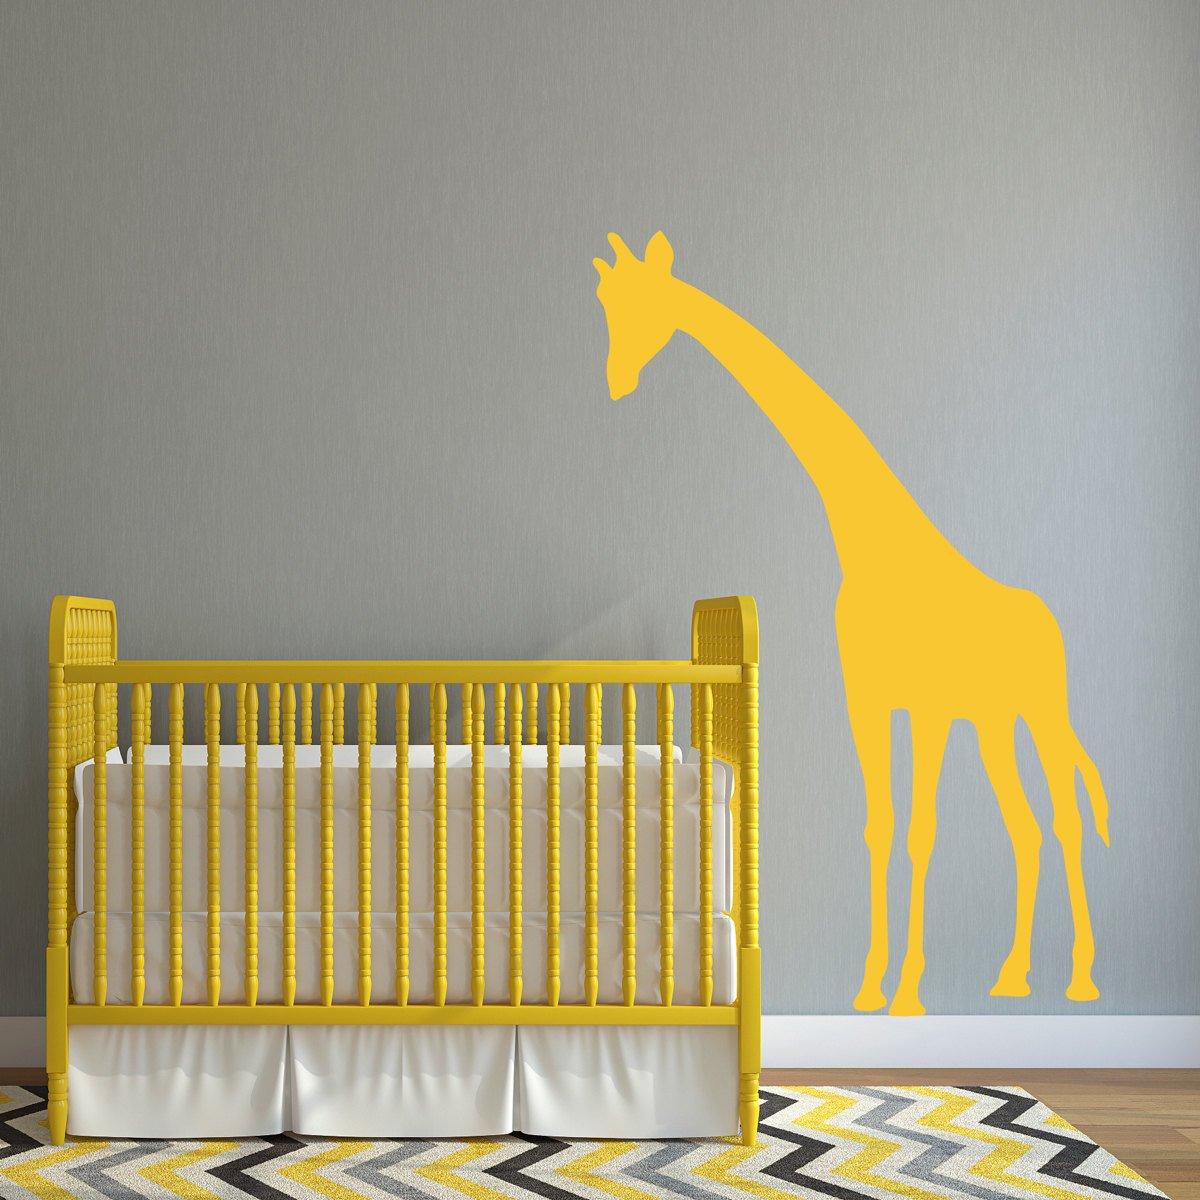 Amazon.com: Poieloi Giraffe Decal Leaning Over Crib Nursery Wall ...